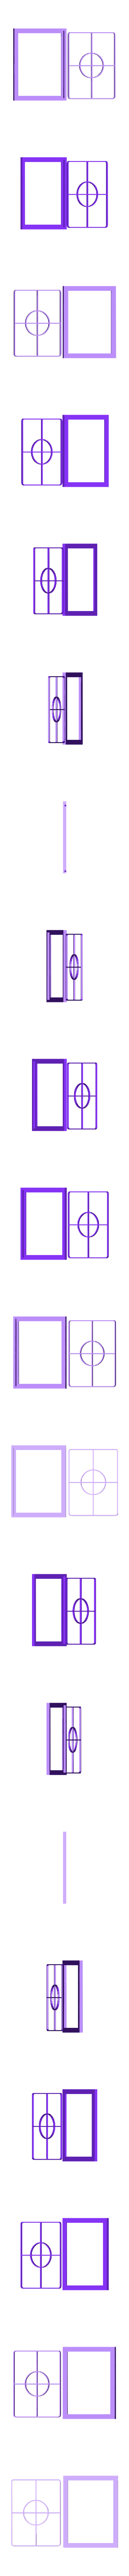 63X85mmPictureFrame.stl Download free STL file 63 x 85mm Picture Frame • 3D printable model, Milan_Gajic